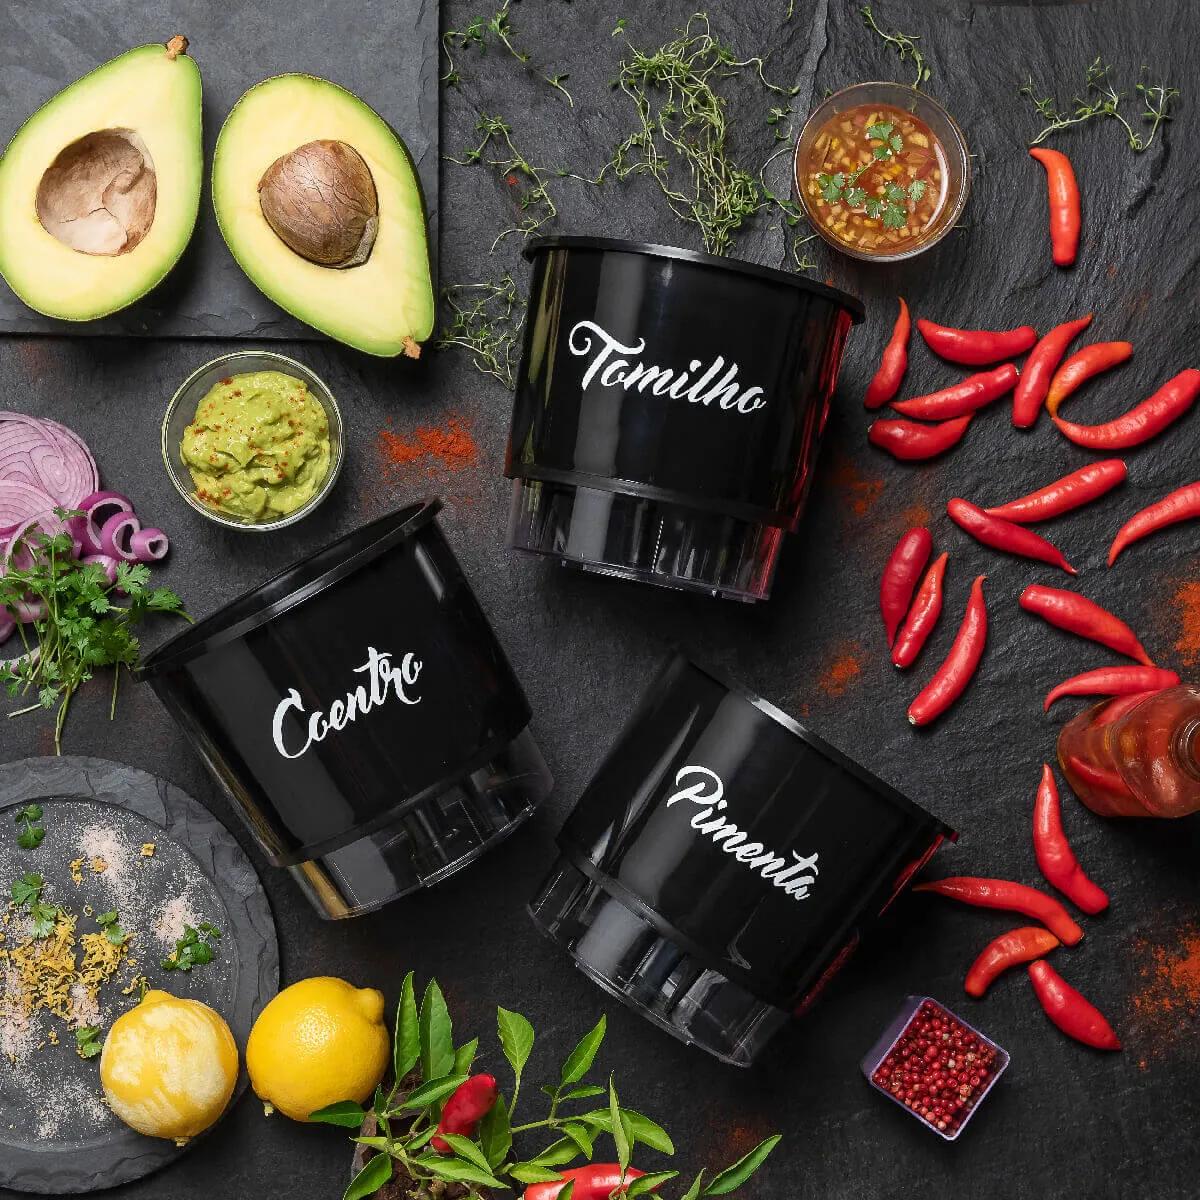 Kit Plantio Completo Gourmet México  - Vasos Raiz Loja Oficial